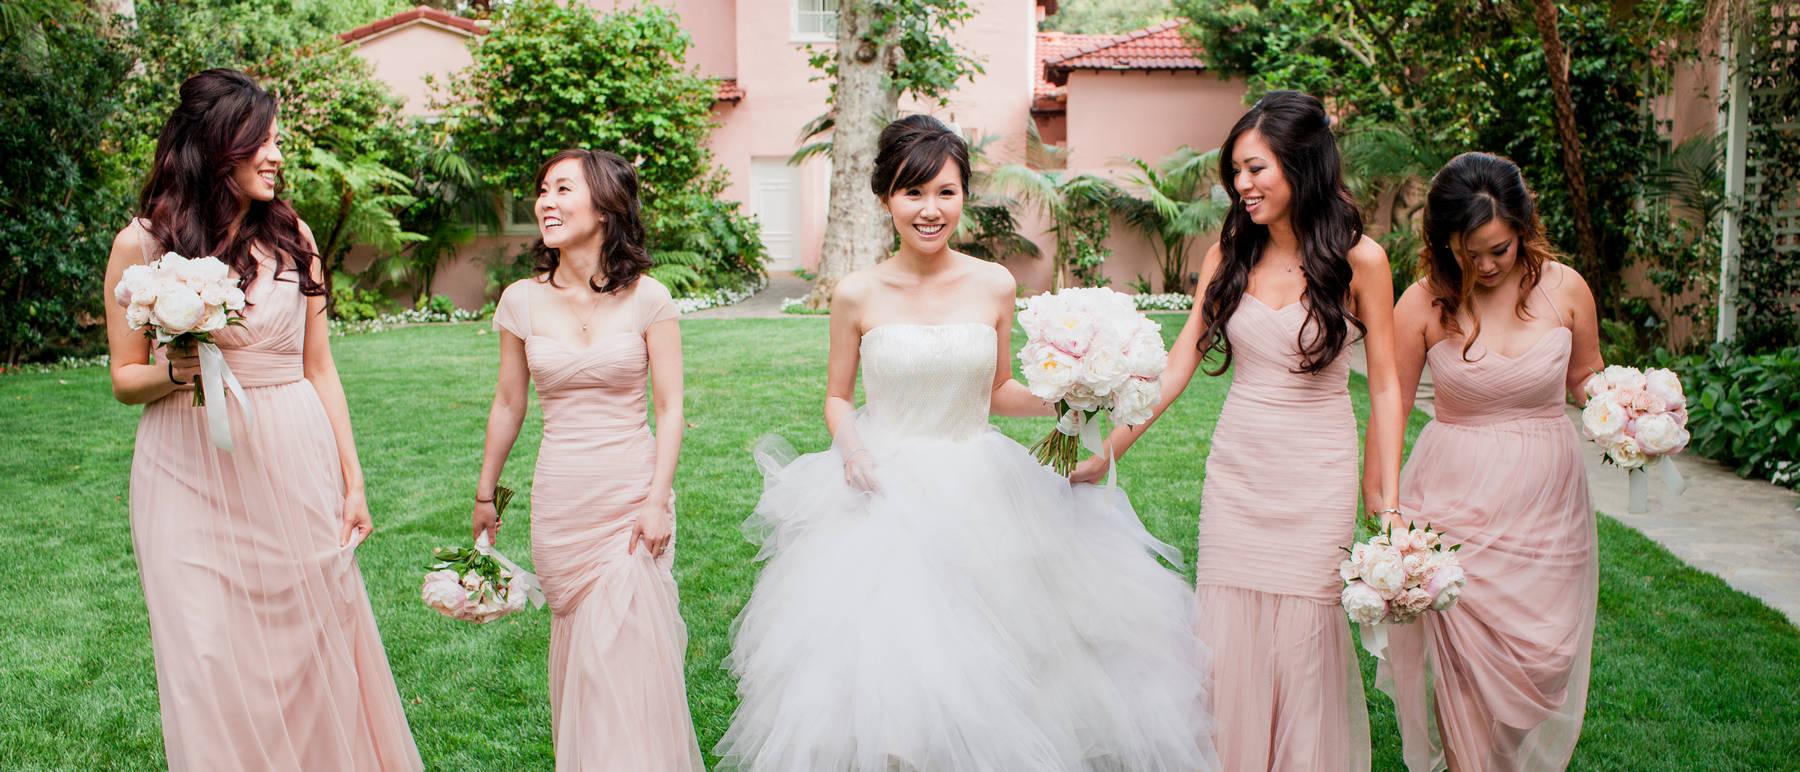 johnandjoseph-wedding-photographer-hz-slider-335